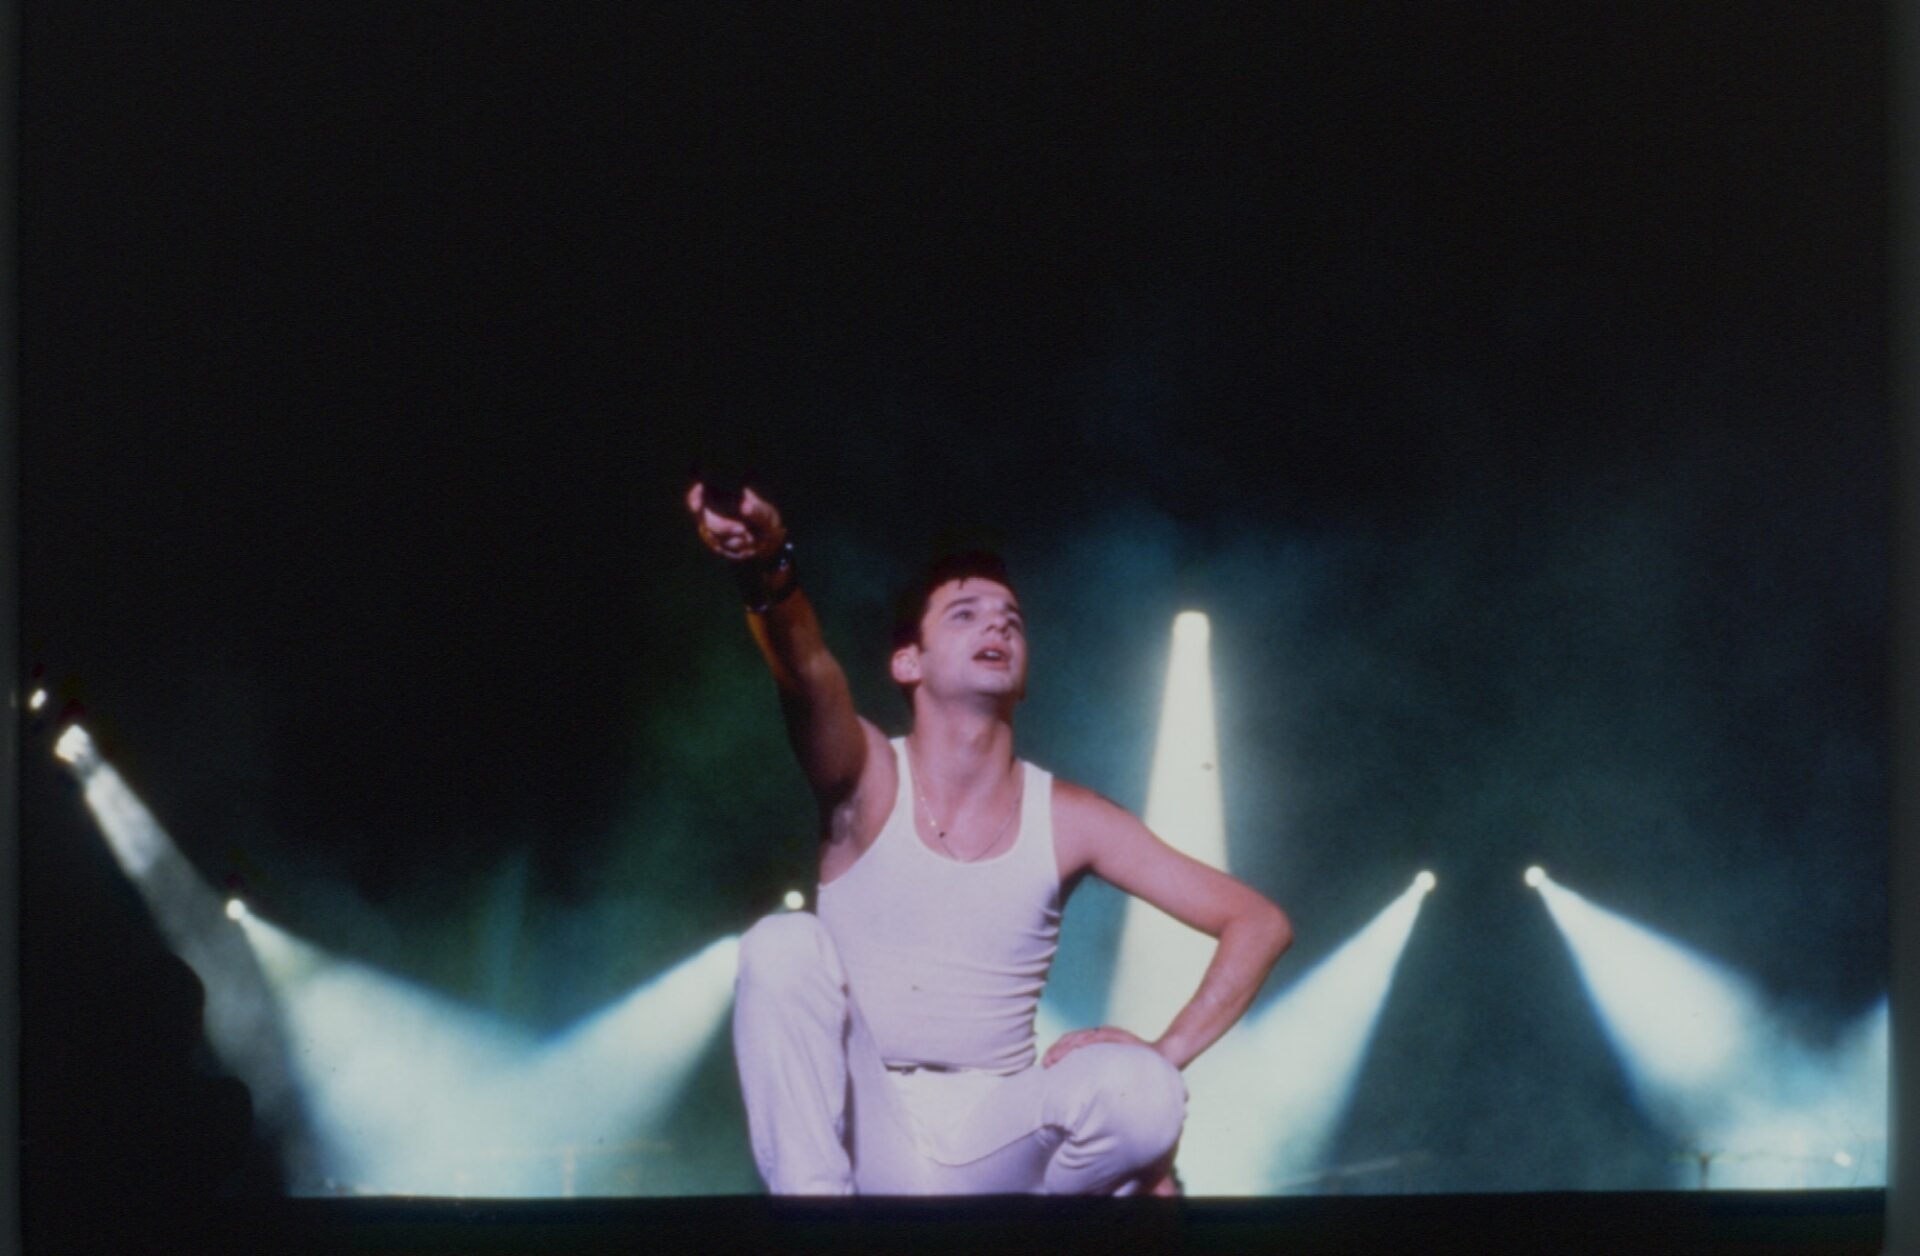 Depeche mode film 2020